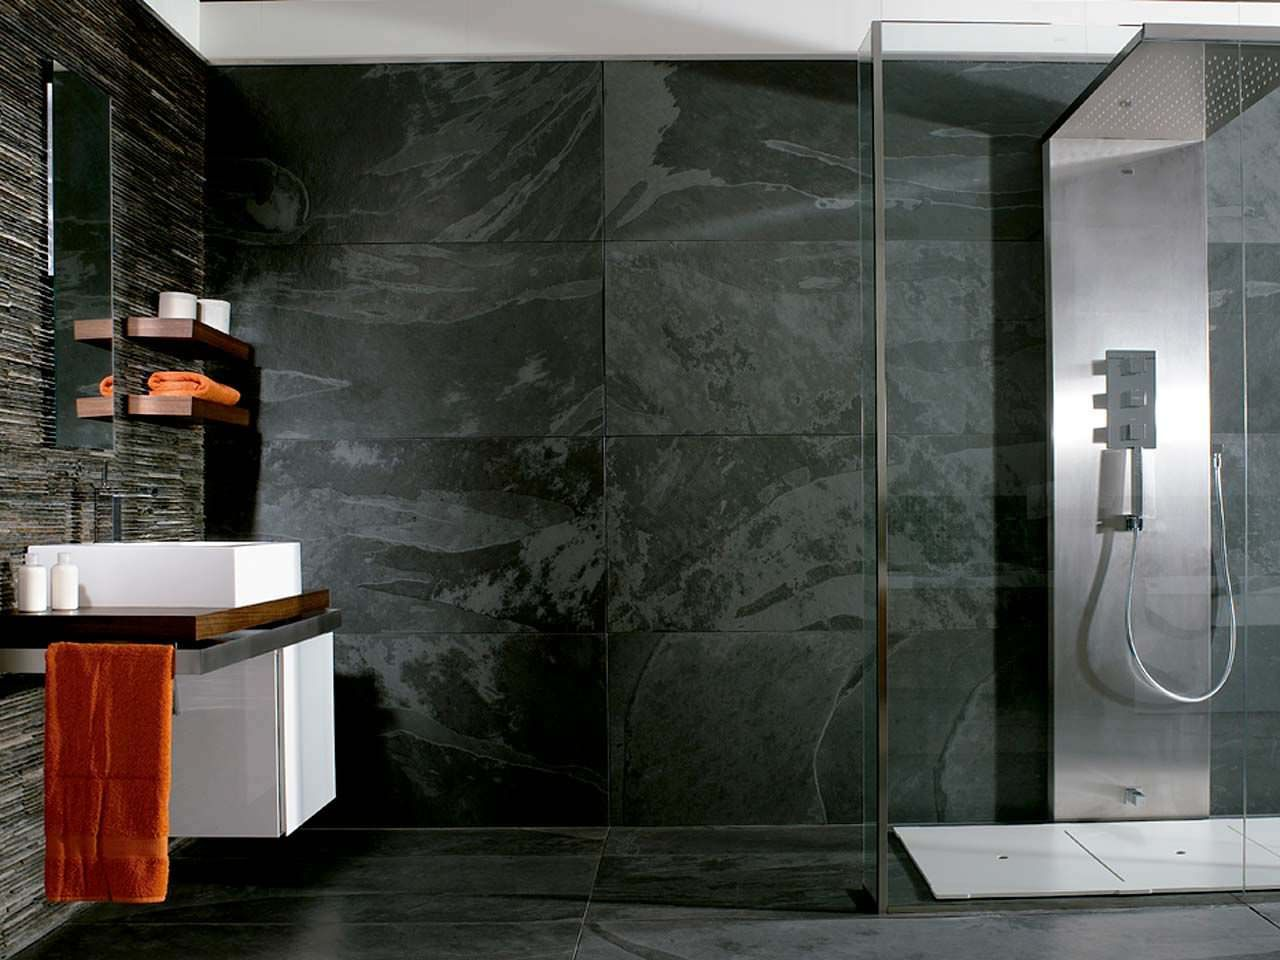 Bagno Ardesia ~ Wall mounted tiles slate plain 12 6410509.jpg 1 280 × 960